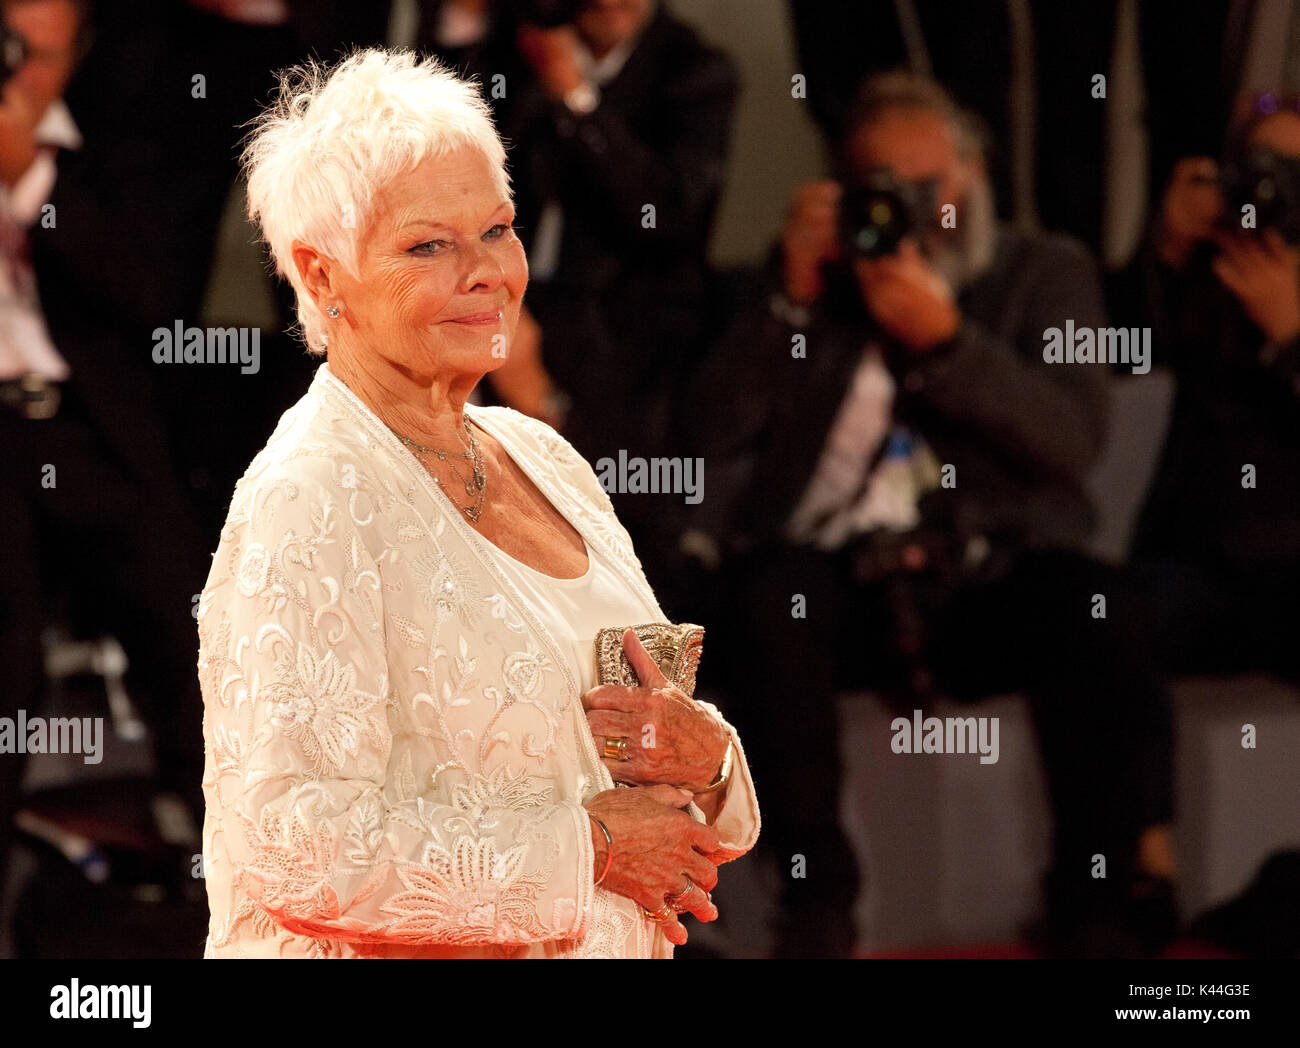 Judi Dench at the premiere of the film Victoria & Abdul at the 74th Venice Film Festival, Sala Grande on Sunday - Stock Image